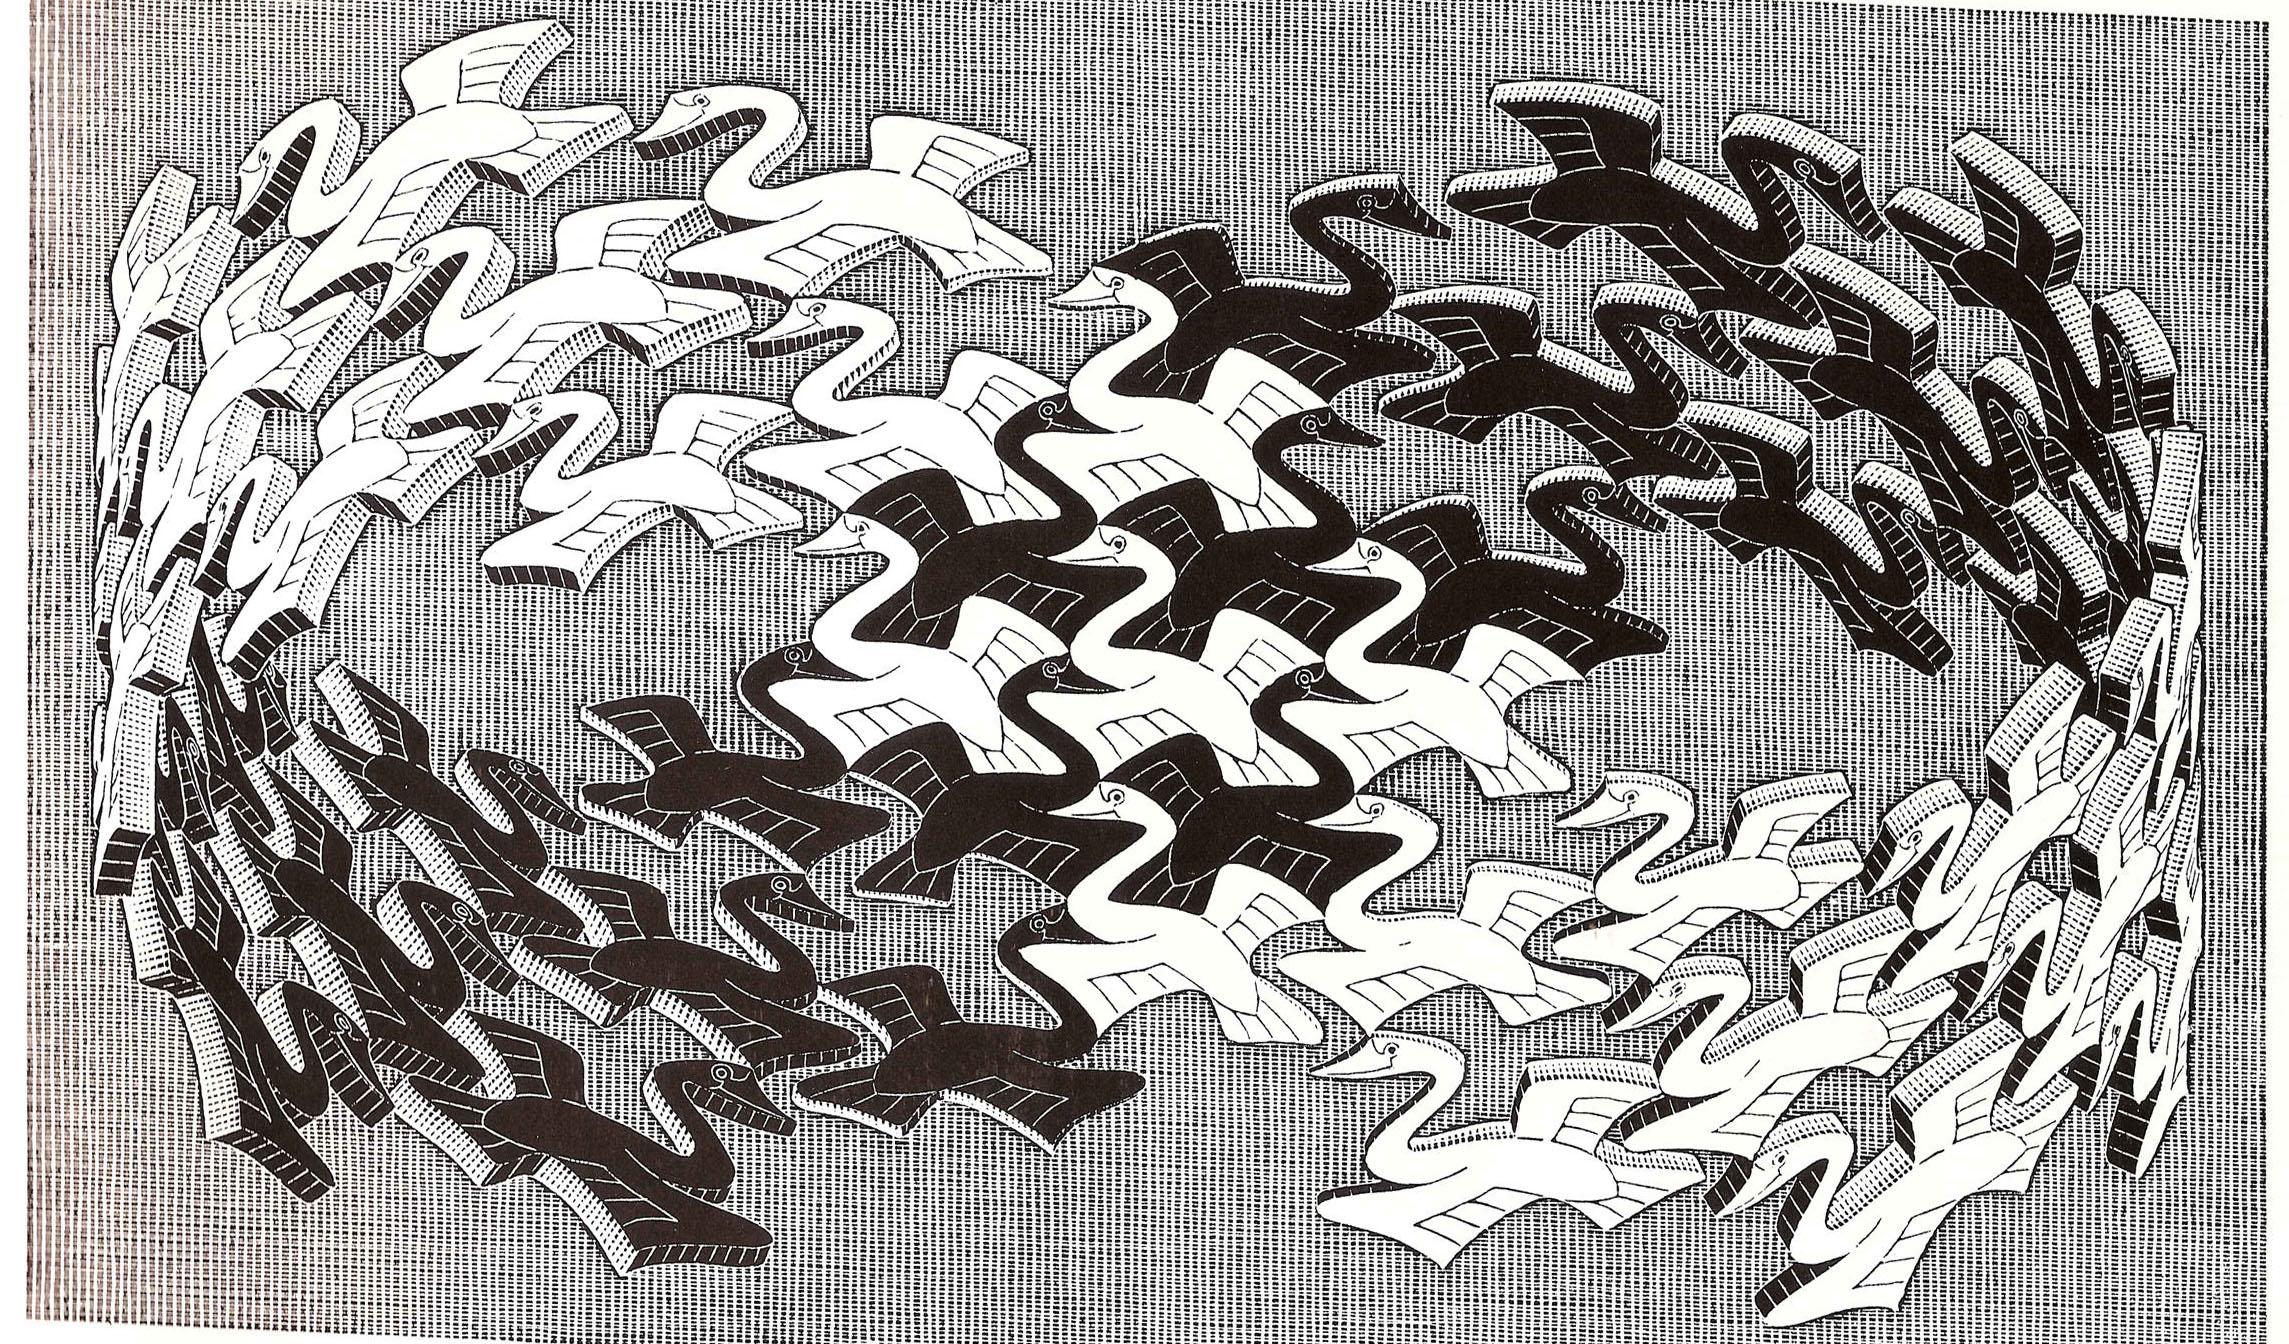 Wallpaper drawing pattern art tree design black and